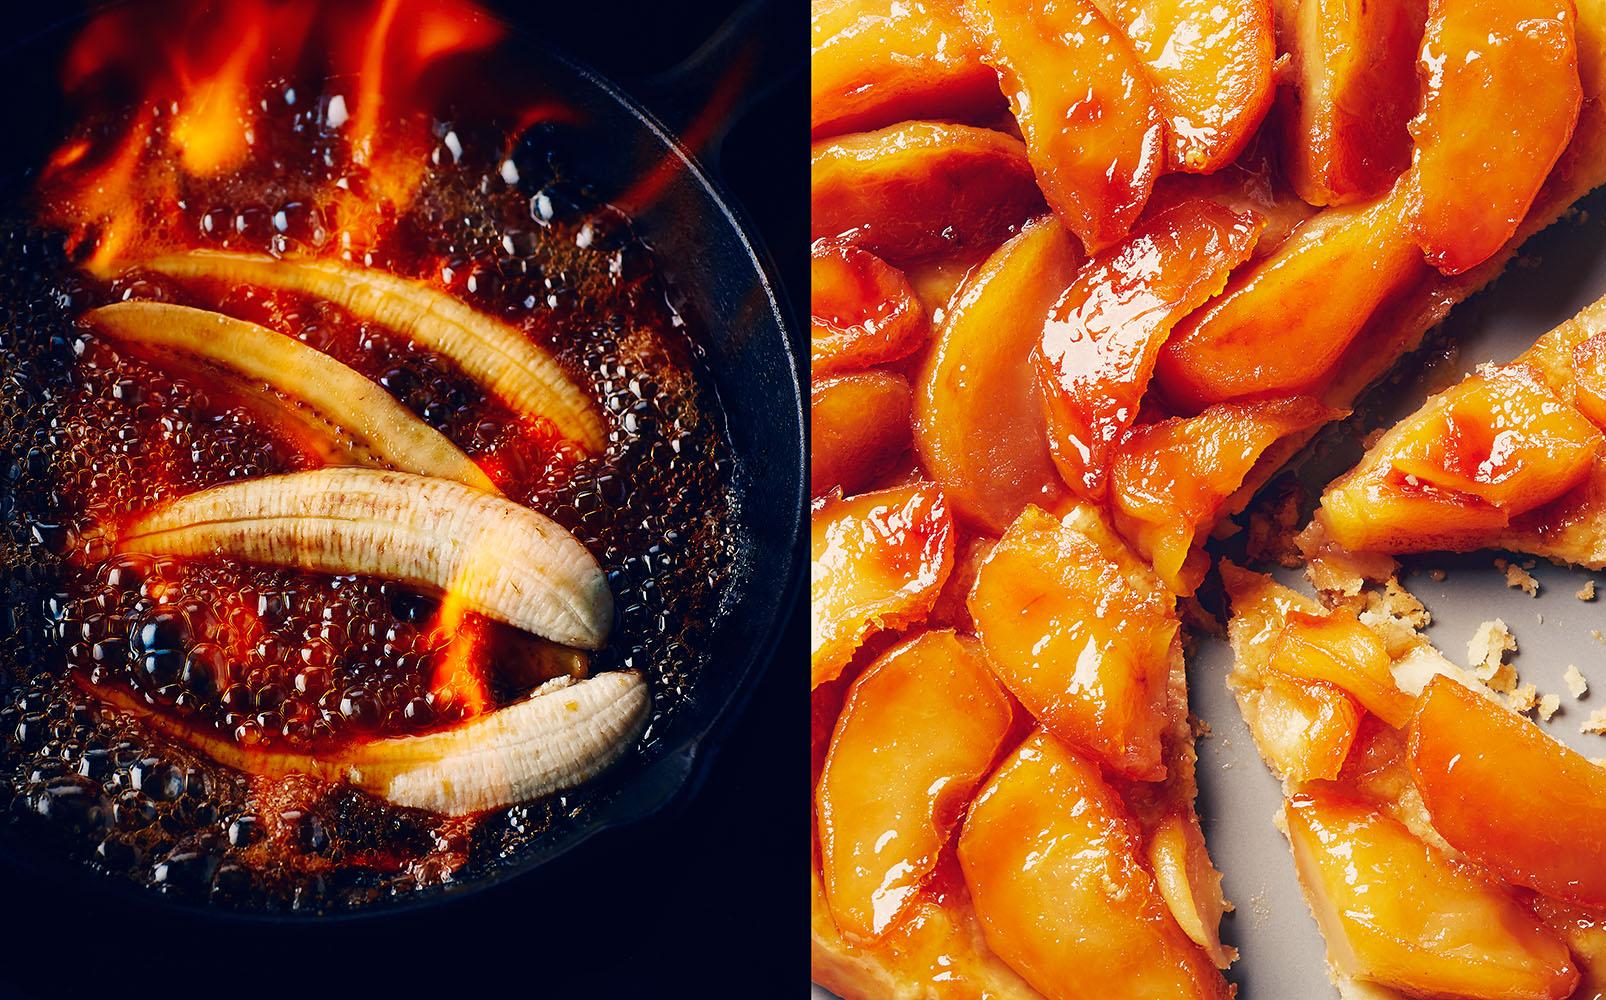 New_Food_03 copy.jpg